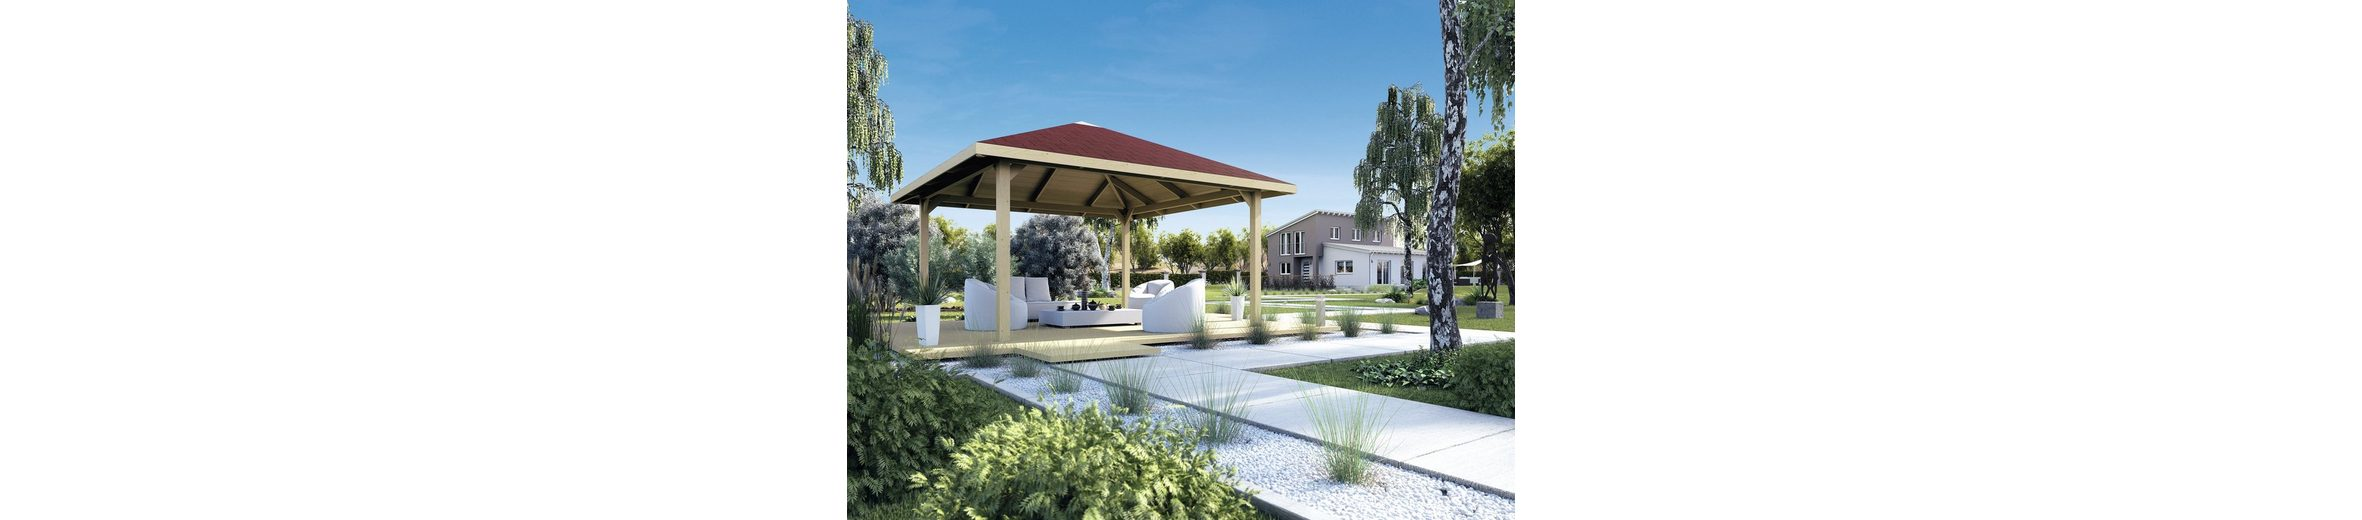 Pavillon »Paradies 1«